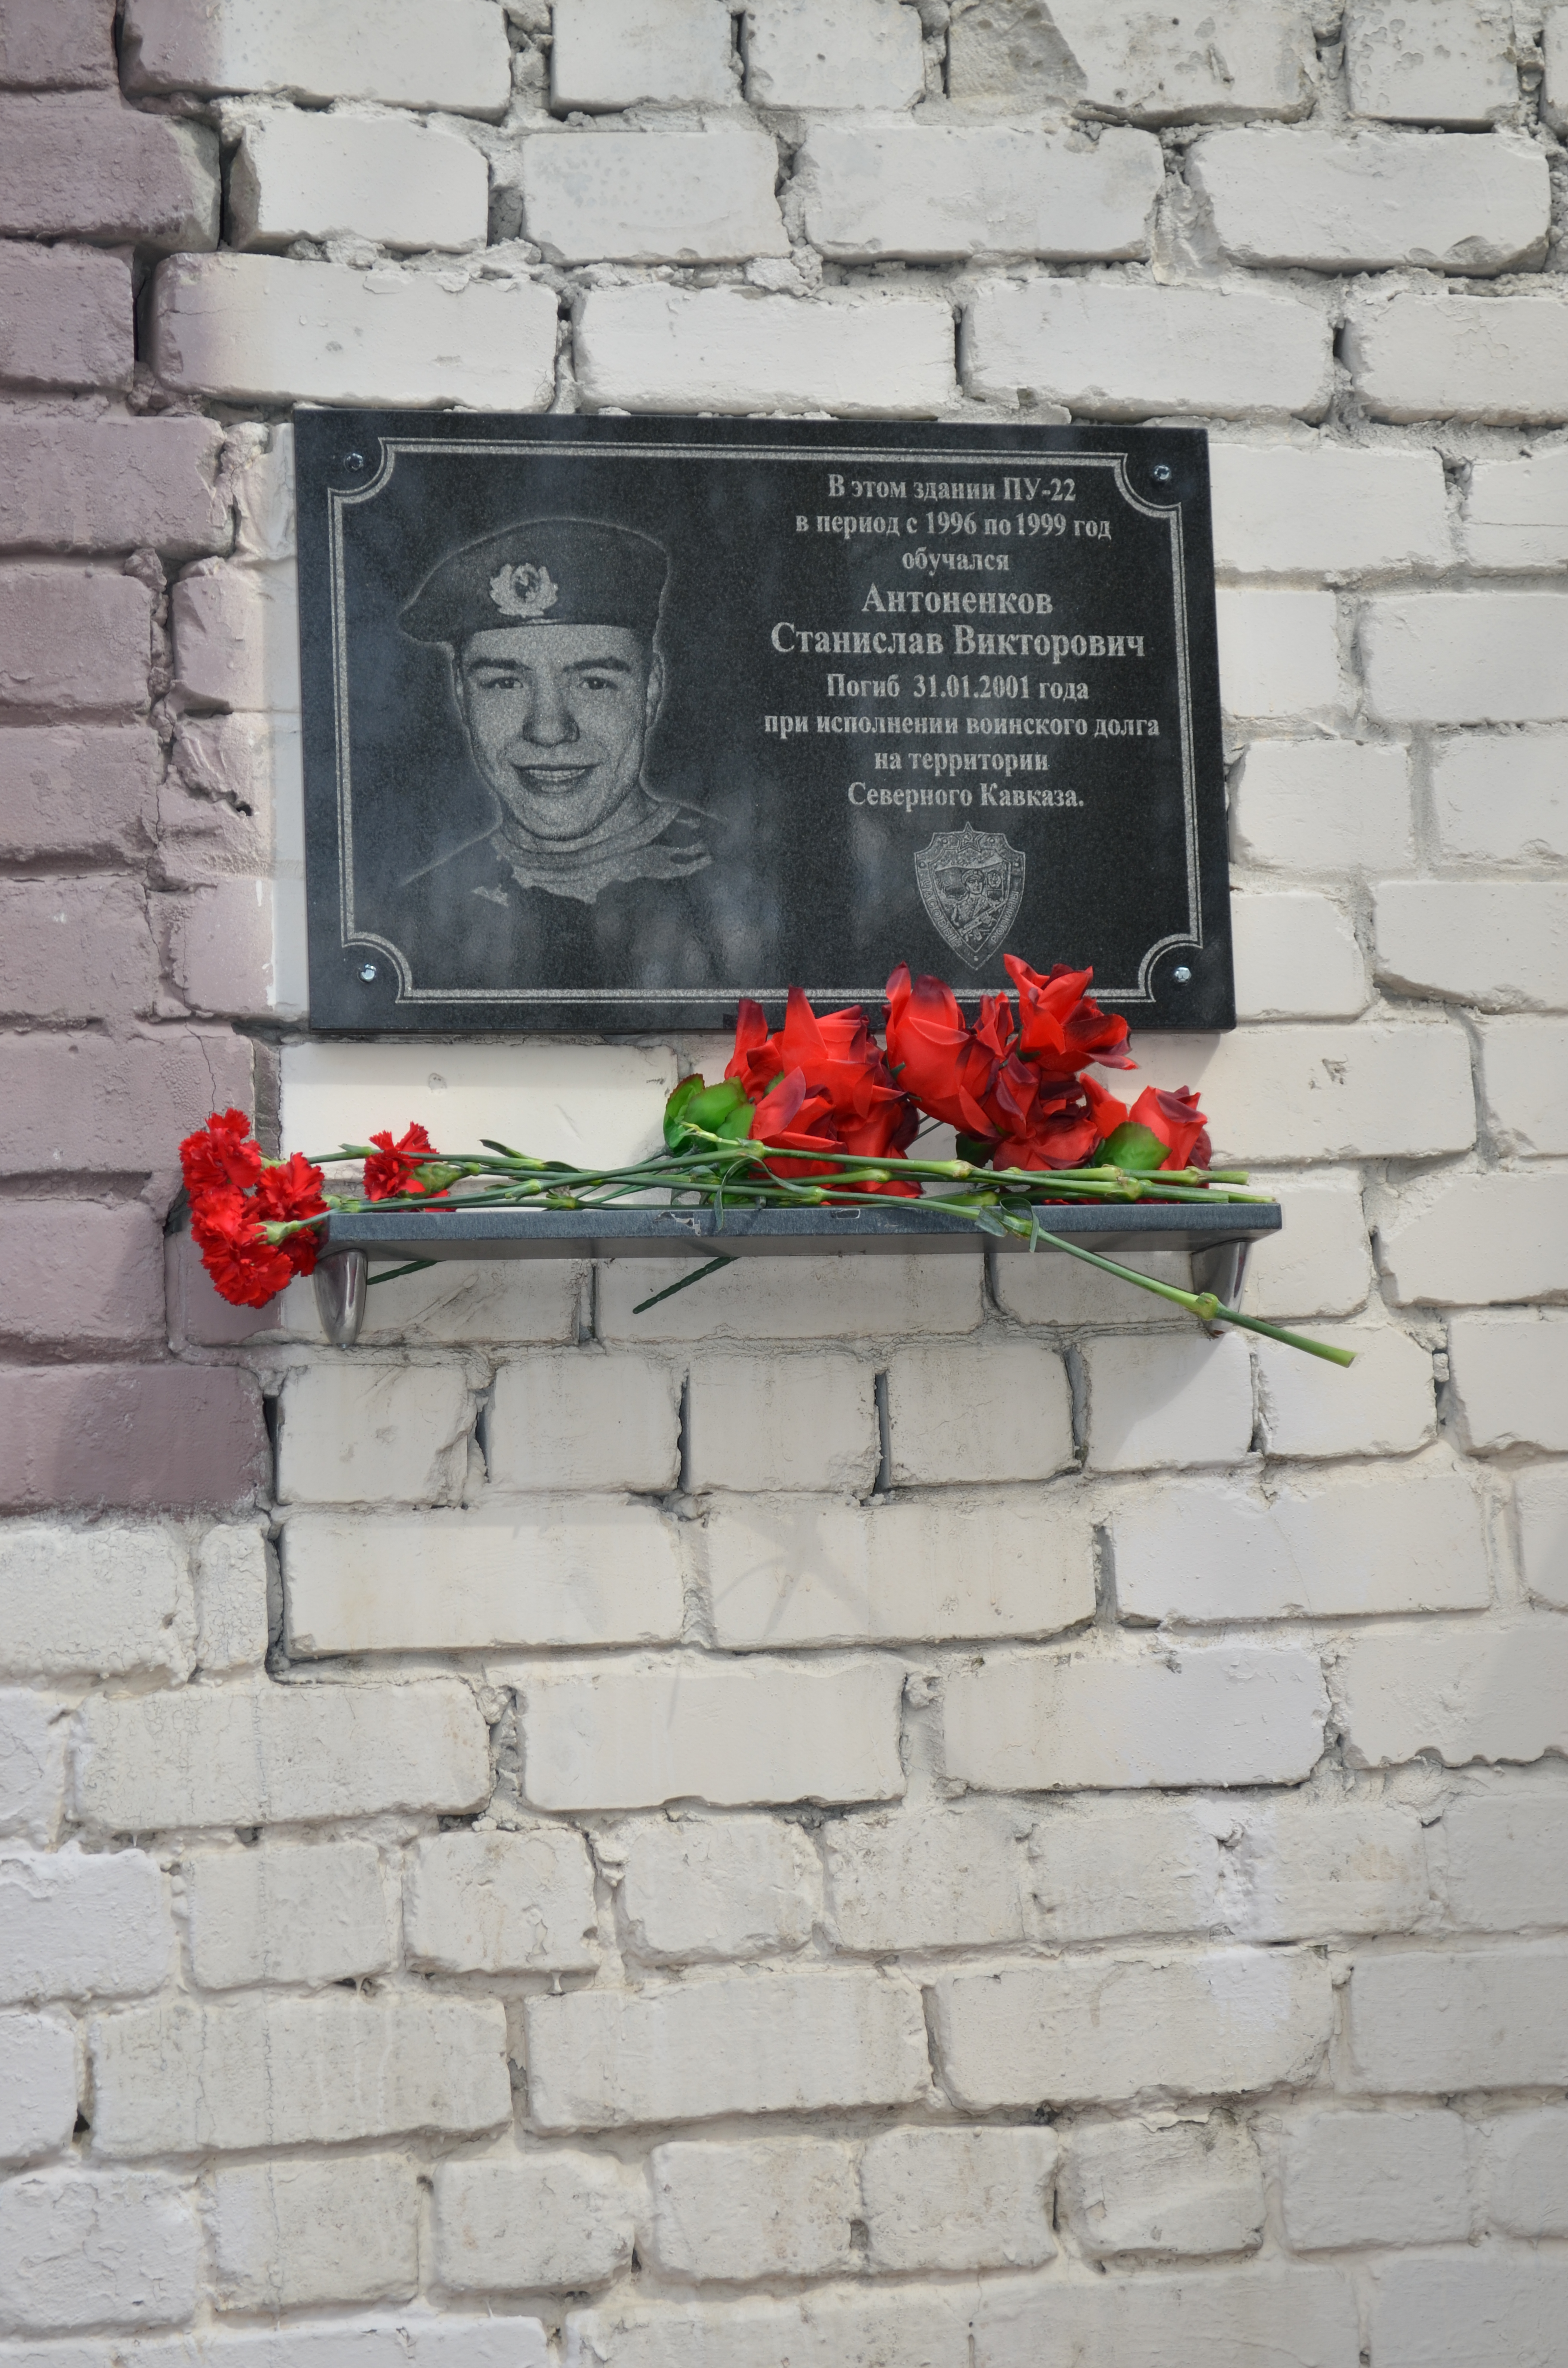 Памяти воина-пограничника младшего сержанта  Станислава Антоненкова